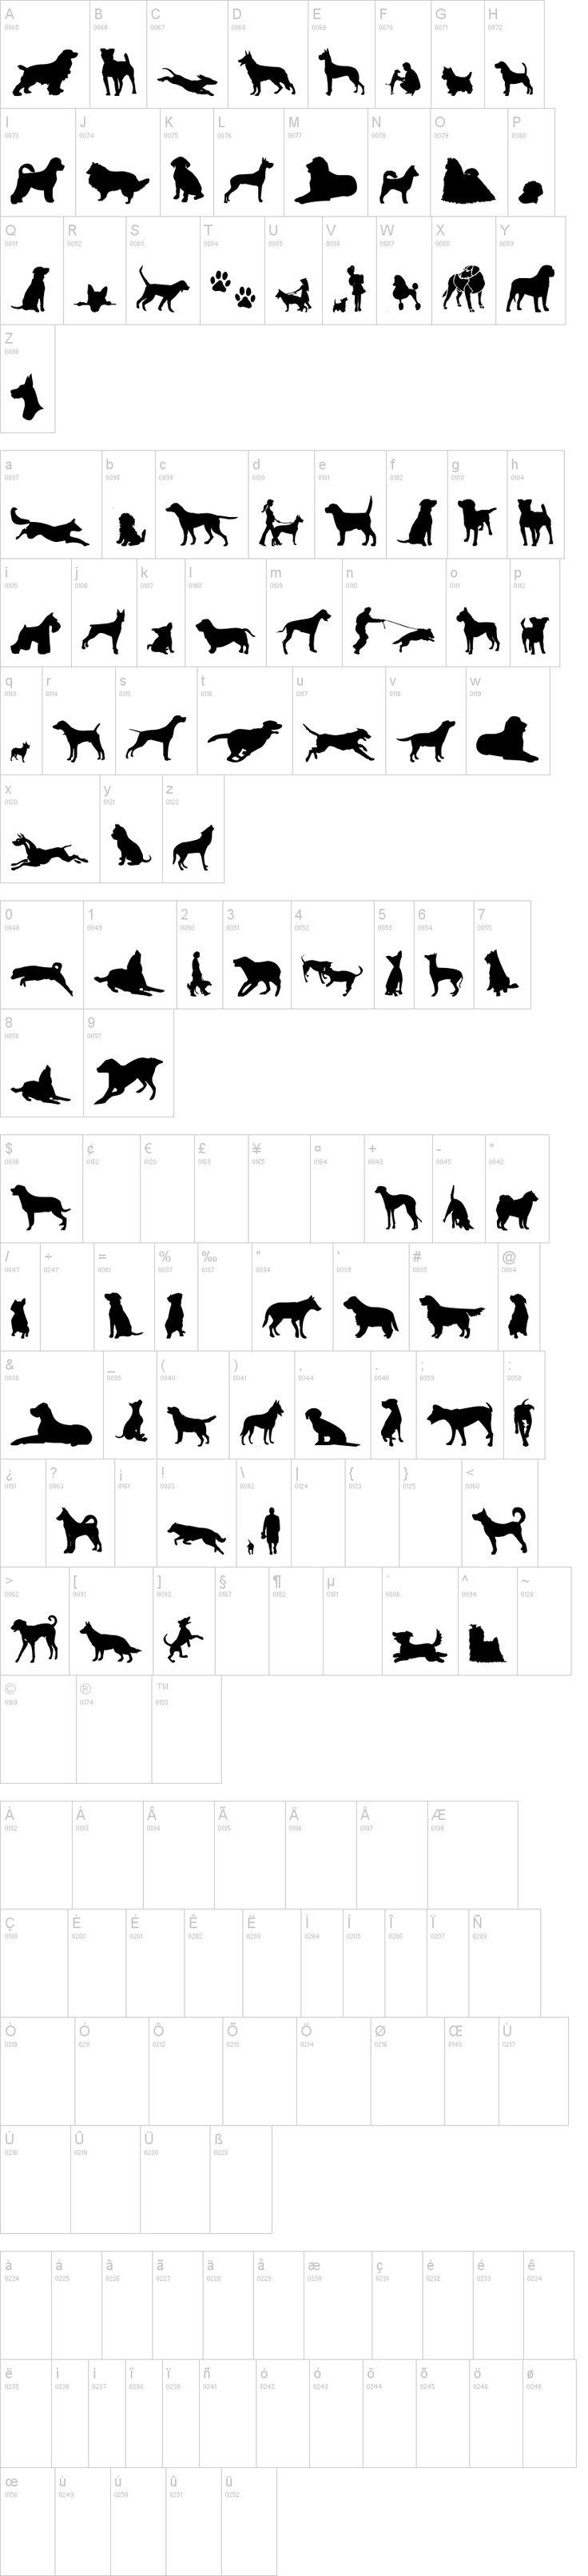 best 25 dog silhouette ideas on pinterest dog outline dog